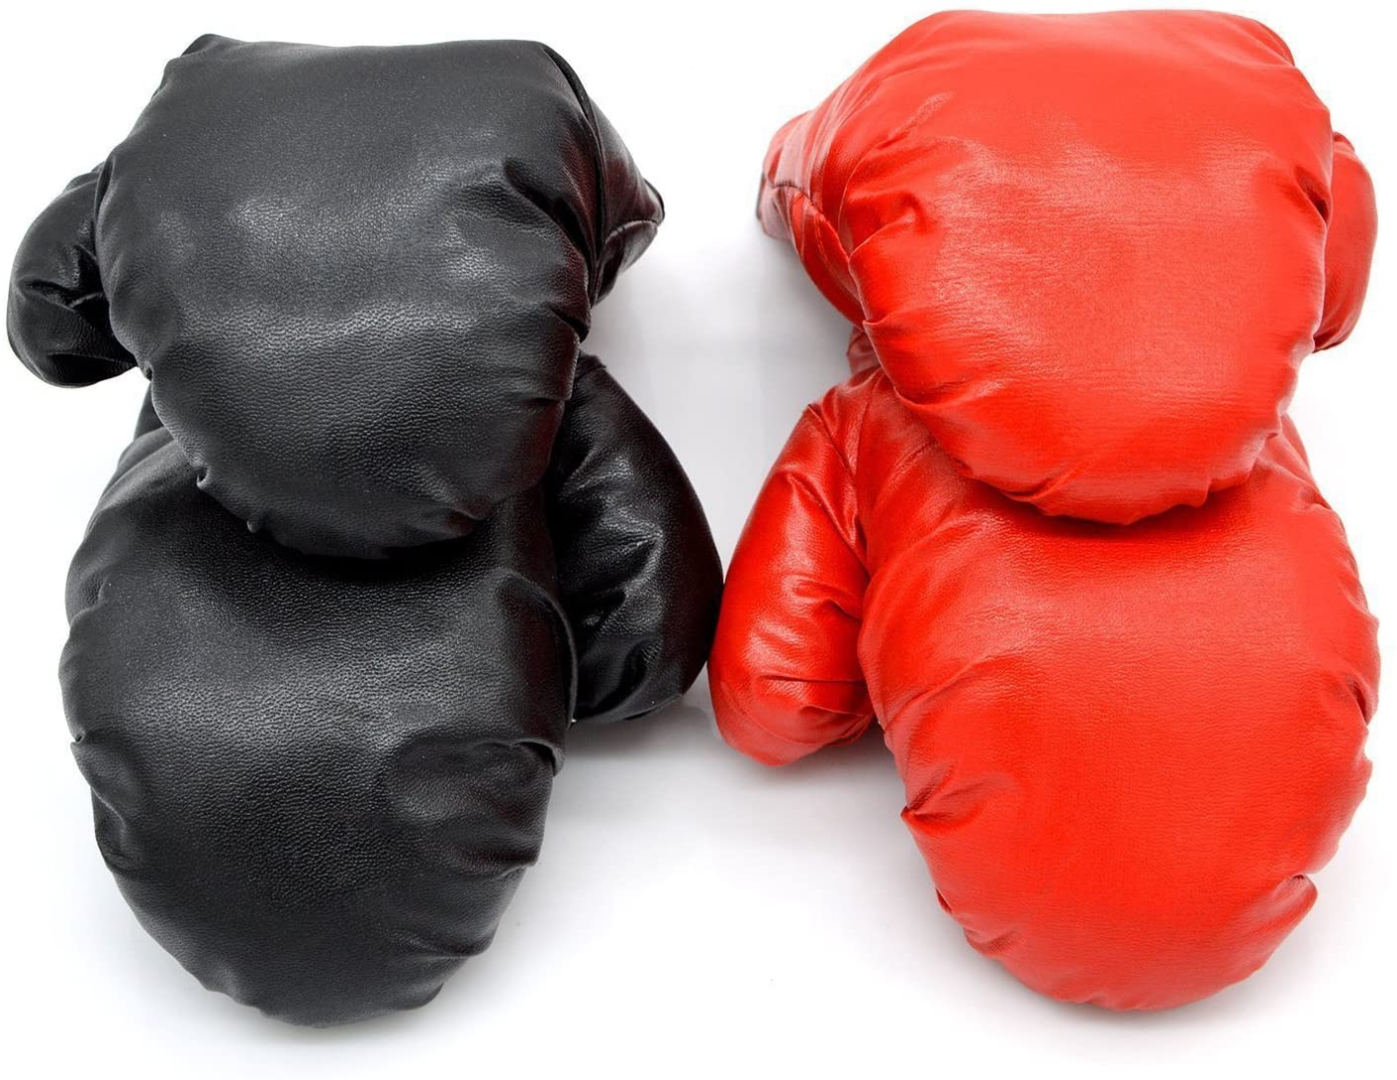 micnaron 2ペア大人用ボクシンググローブ、パンチ手袋、プロフェッショナル耐衝撃レザースパーリング、トレーニンググローブセットPunching Bag Mitts for Men/Women (ブラック+レッド(2ペア))